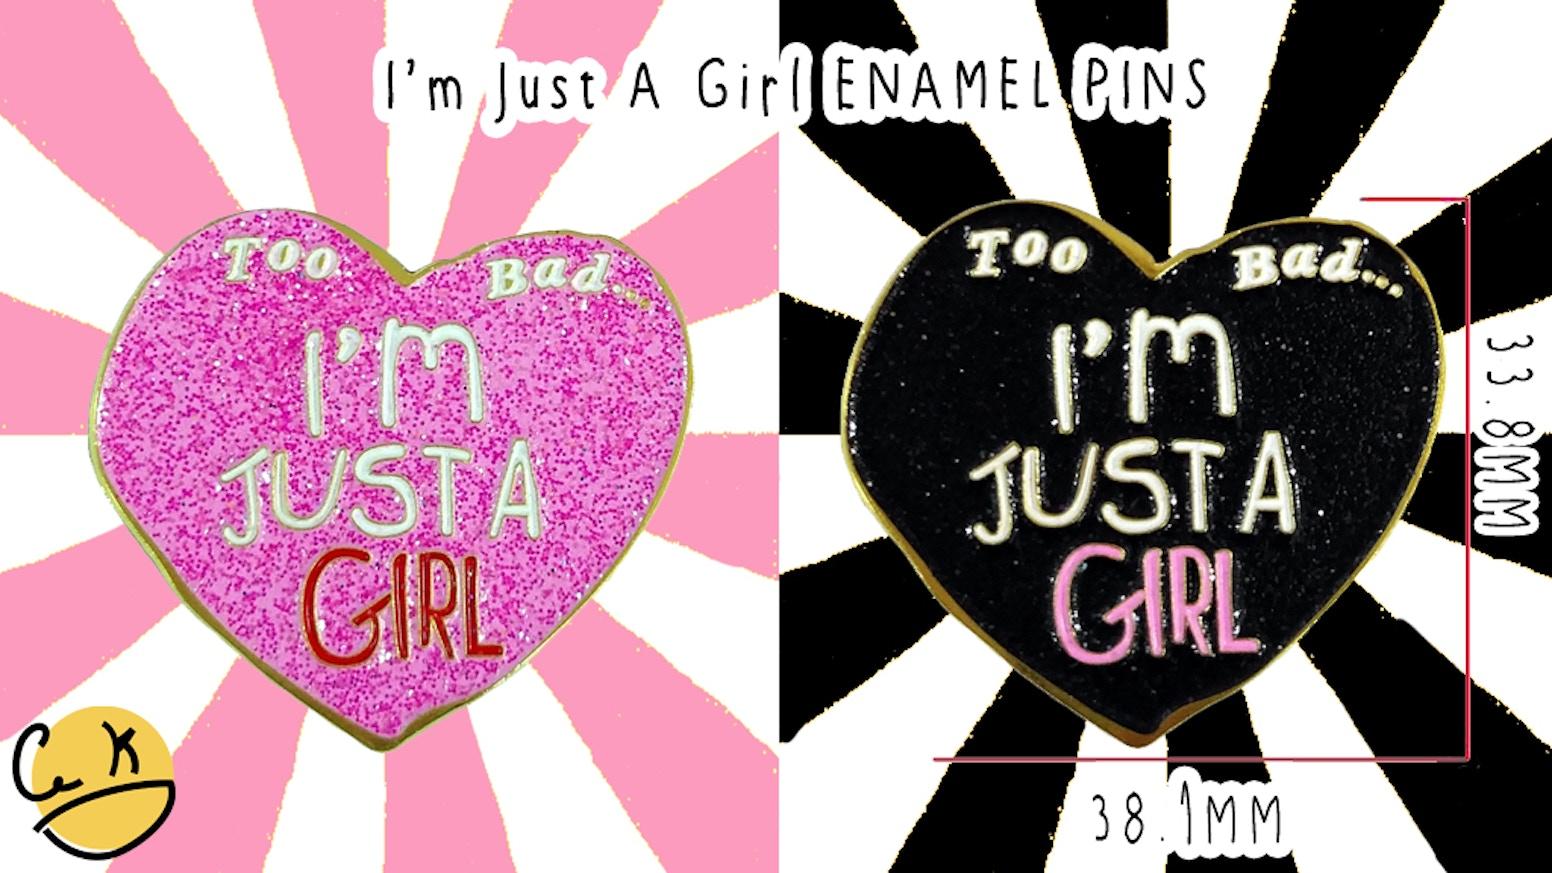 Just A Girl Enamel Pins by Lara King — Kickstarter